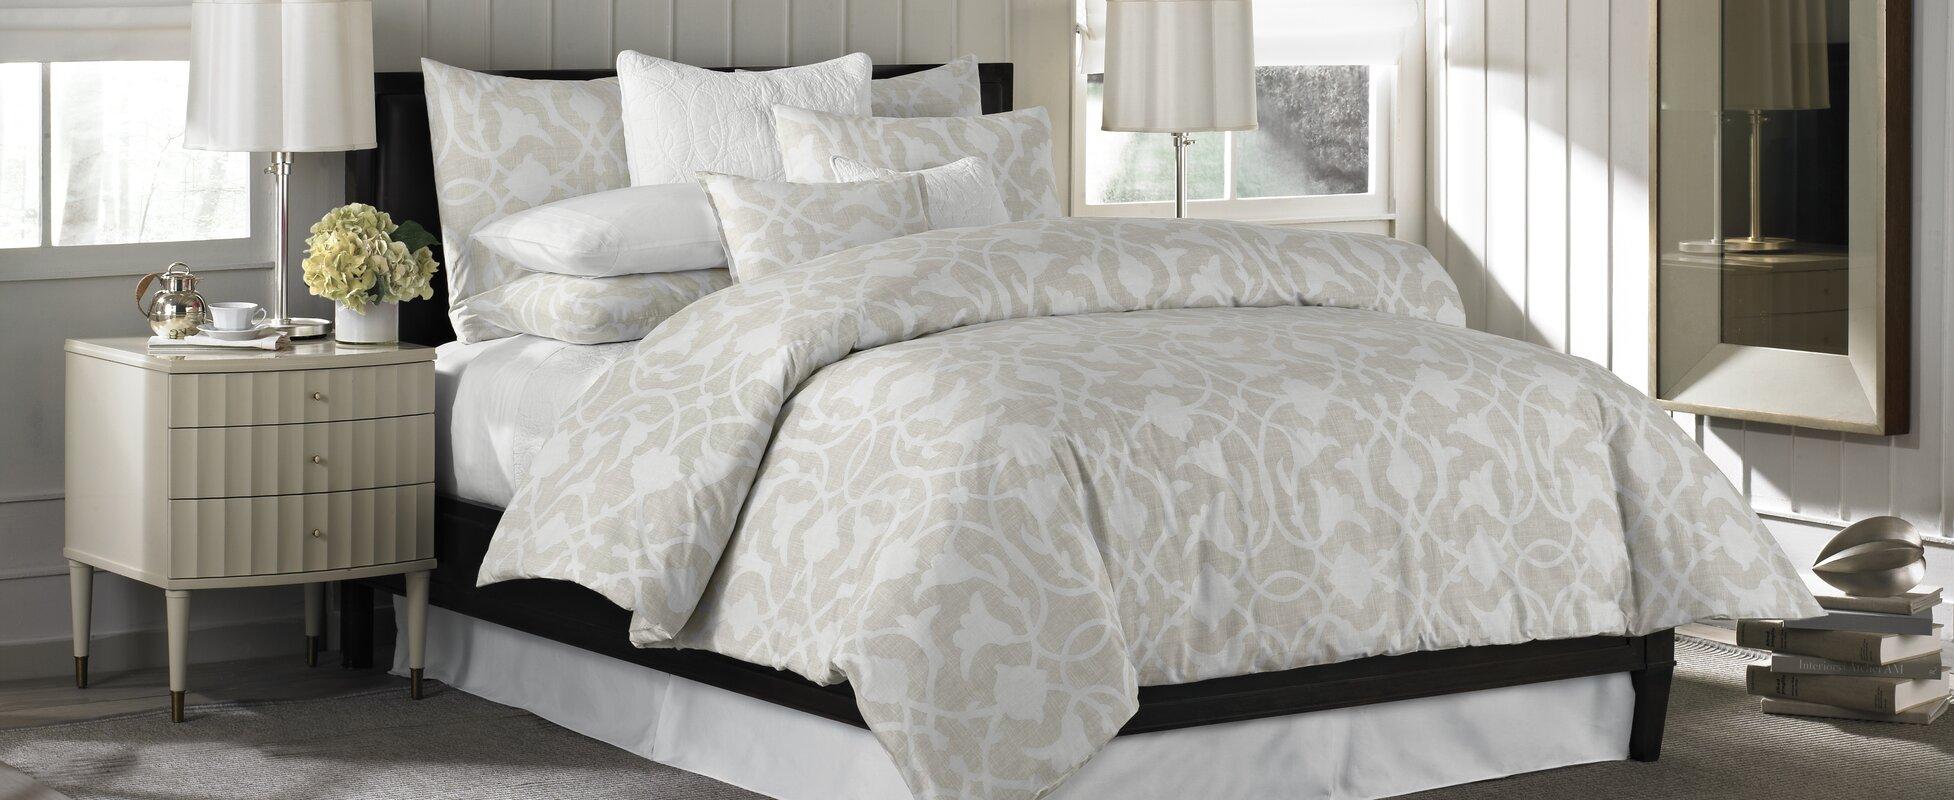 barbara barry poetical 3 piece comforter set & reviews | wayfair